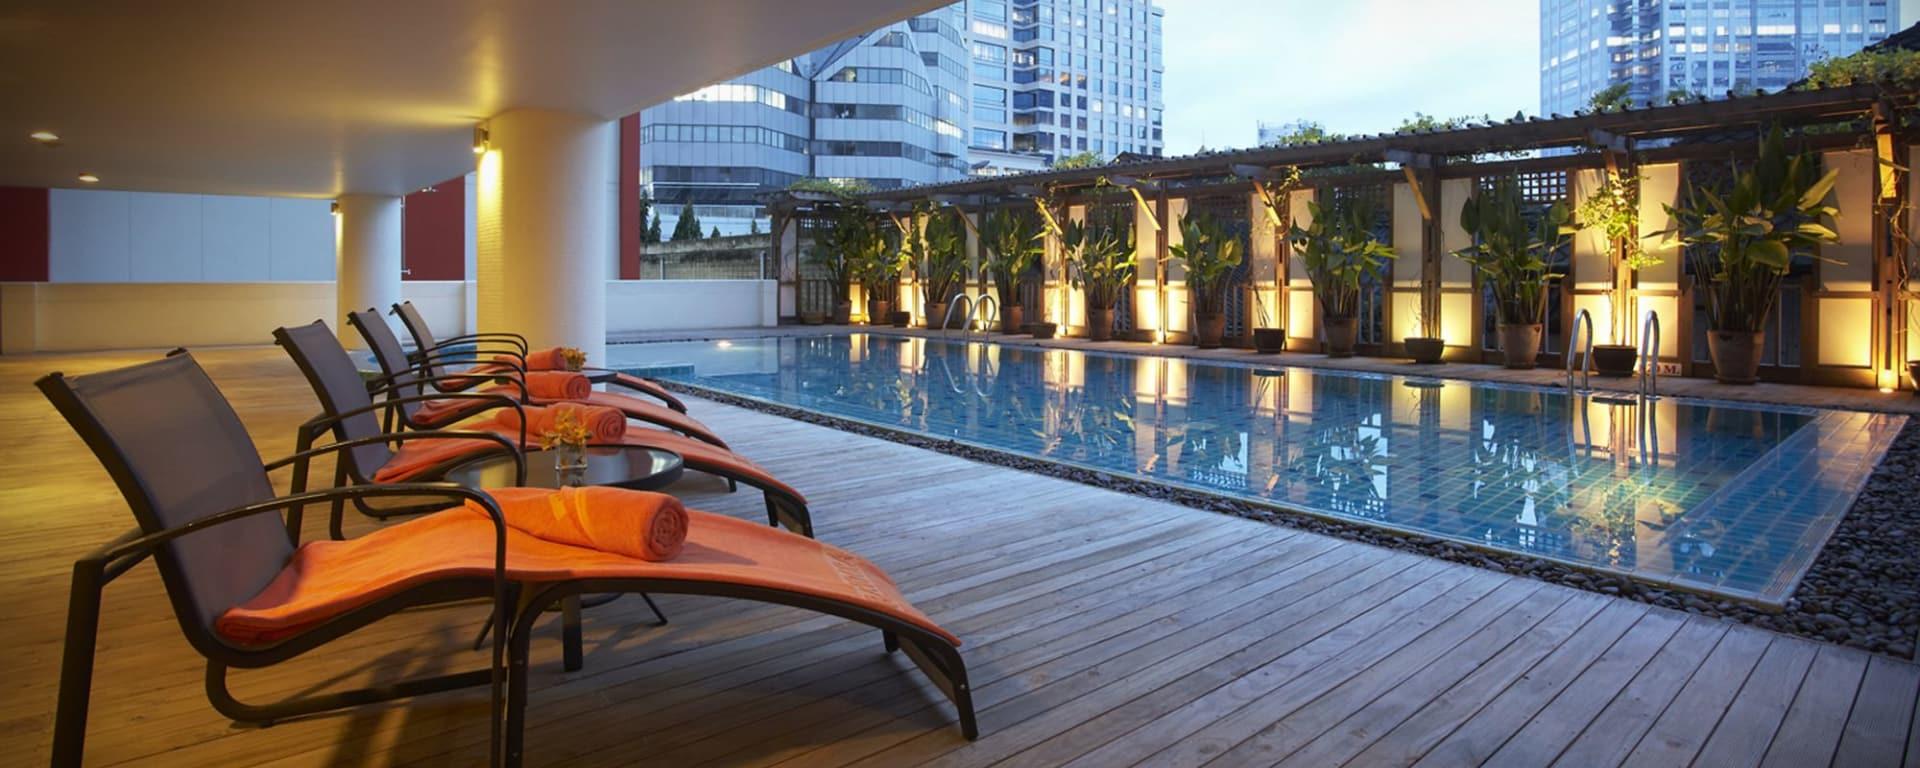 Bandara Suites Silom à Bangkok: poolside